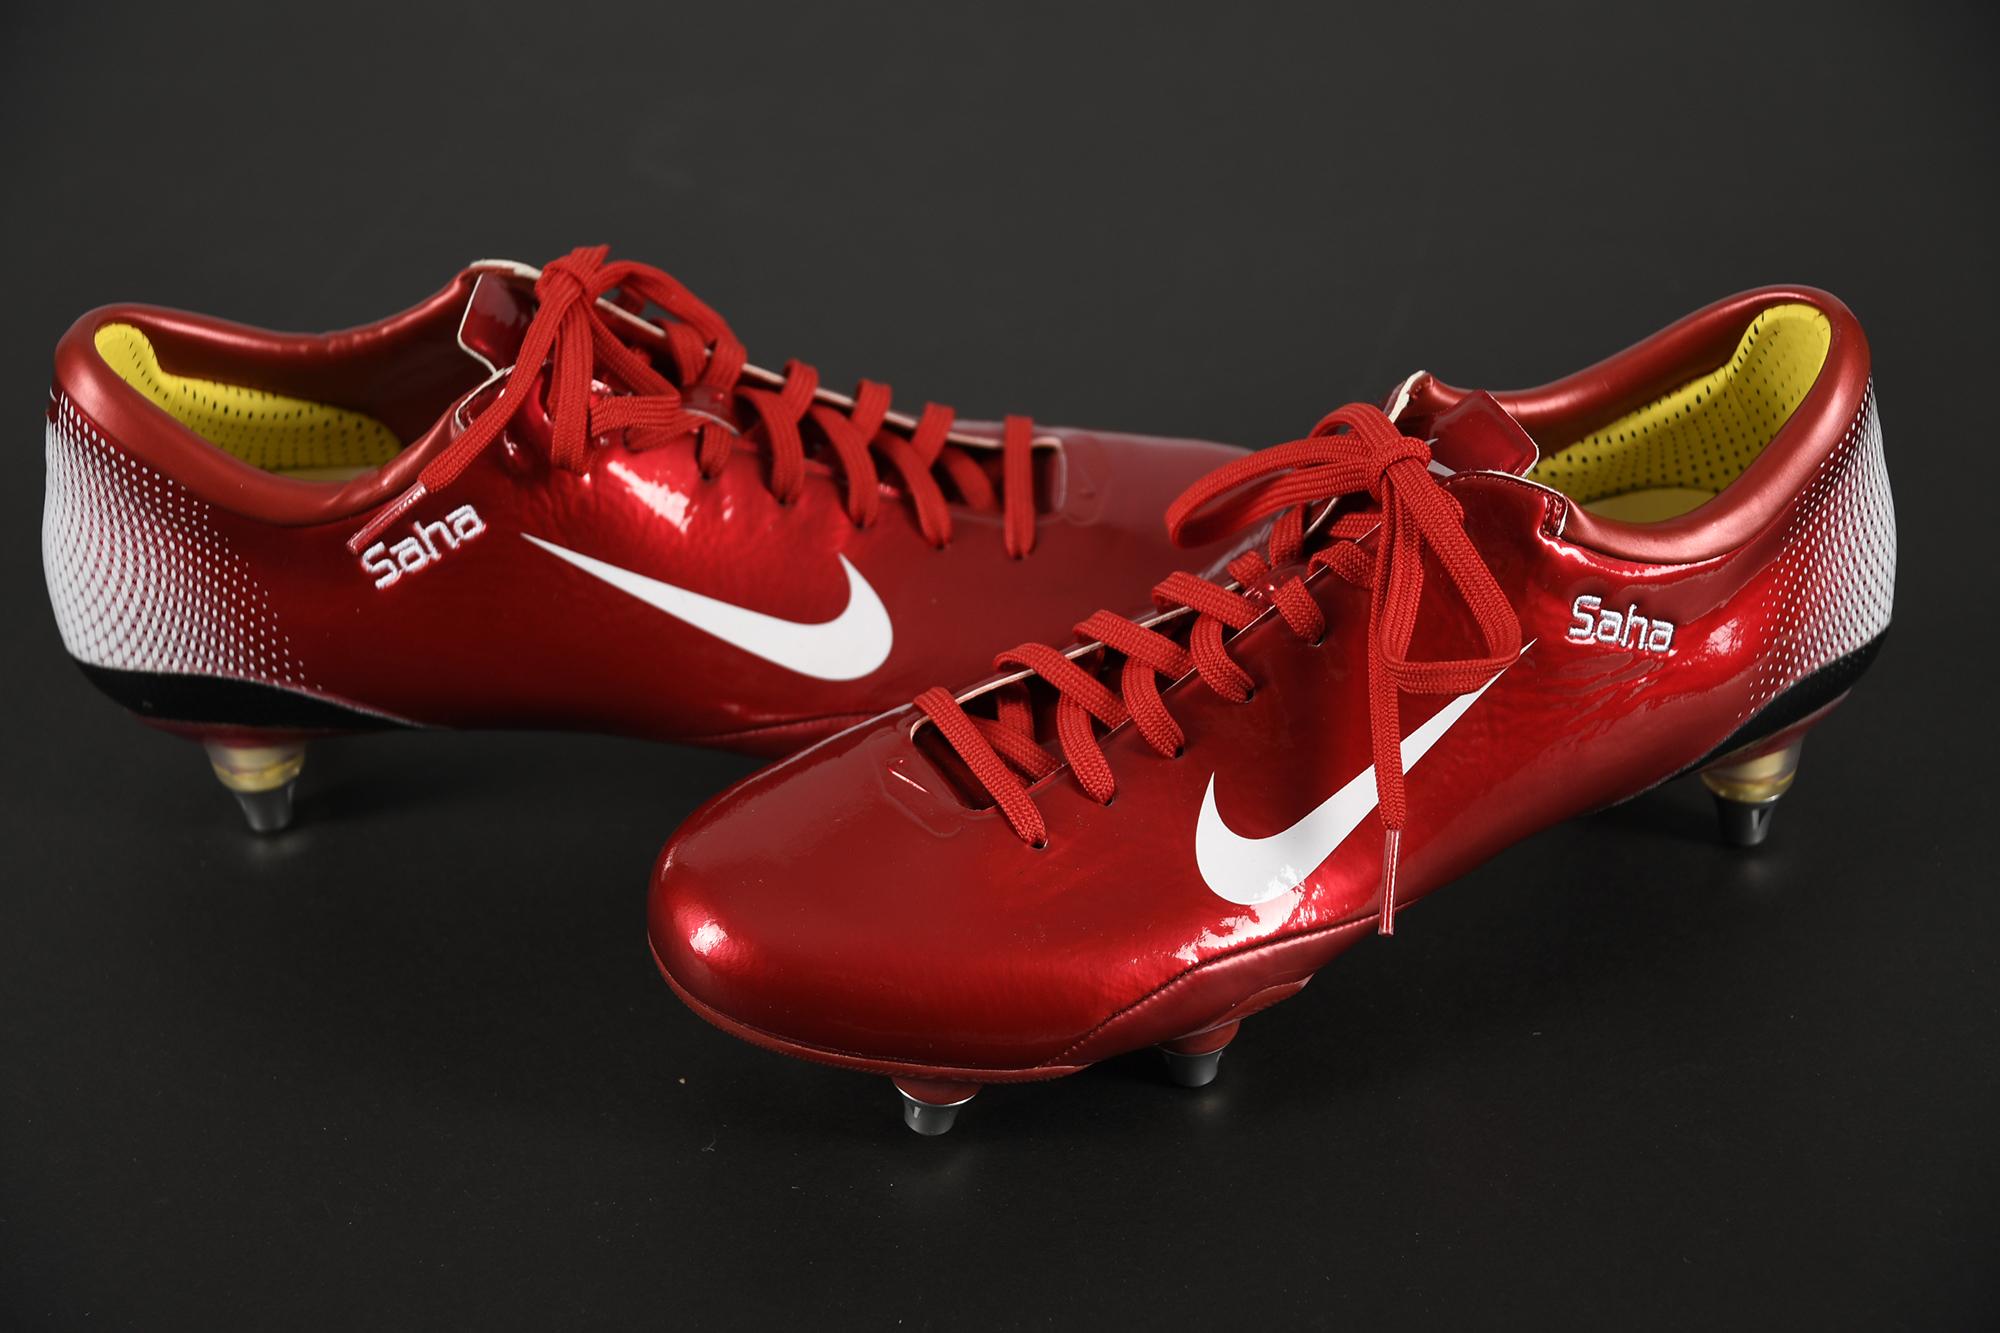 LOUIS SAHA Personalised Football Boots - Image 5 of 5